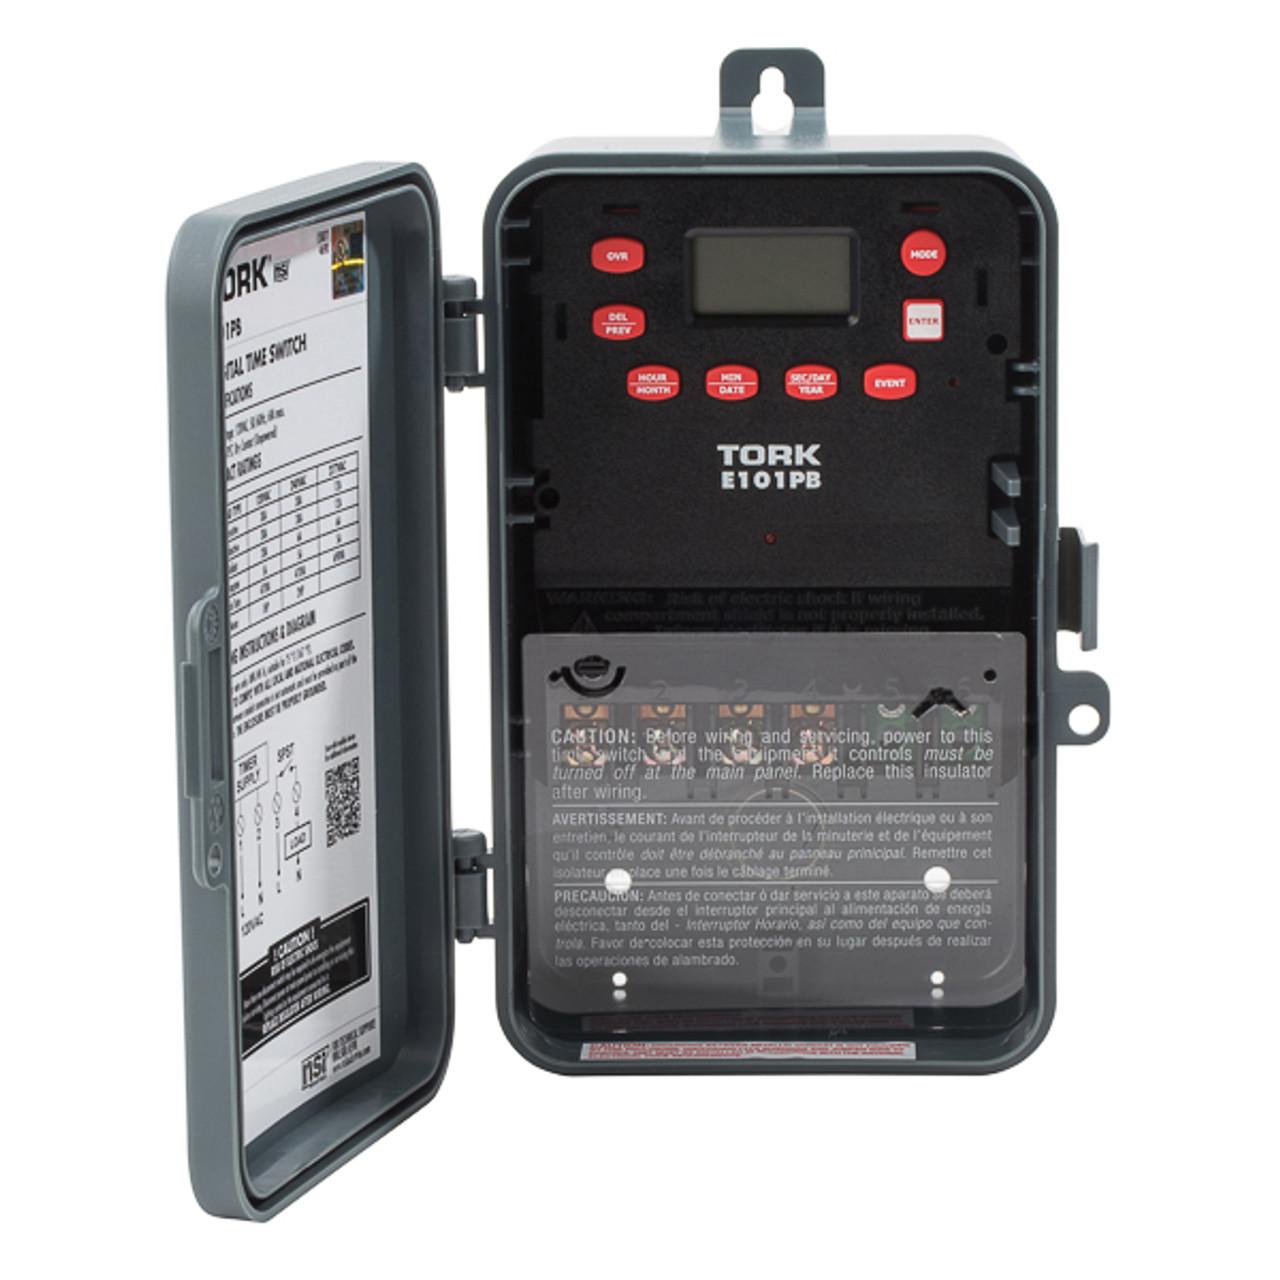 Tork E101PB 24 Hour Digital 1CH 40A 120V SPST Timer